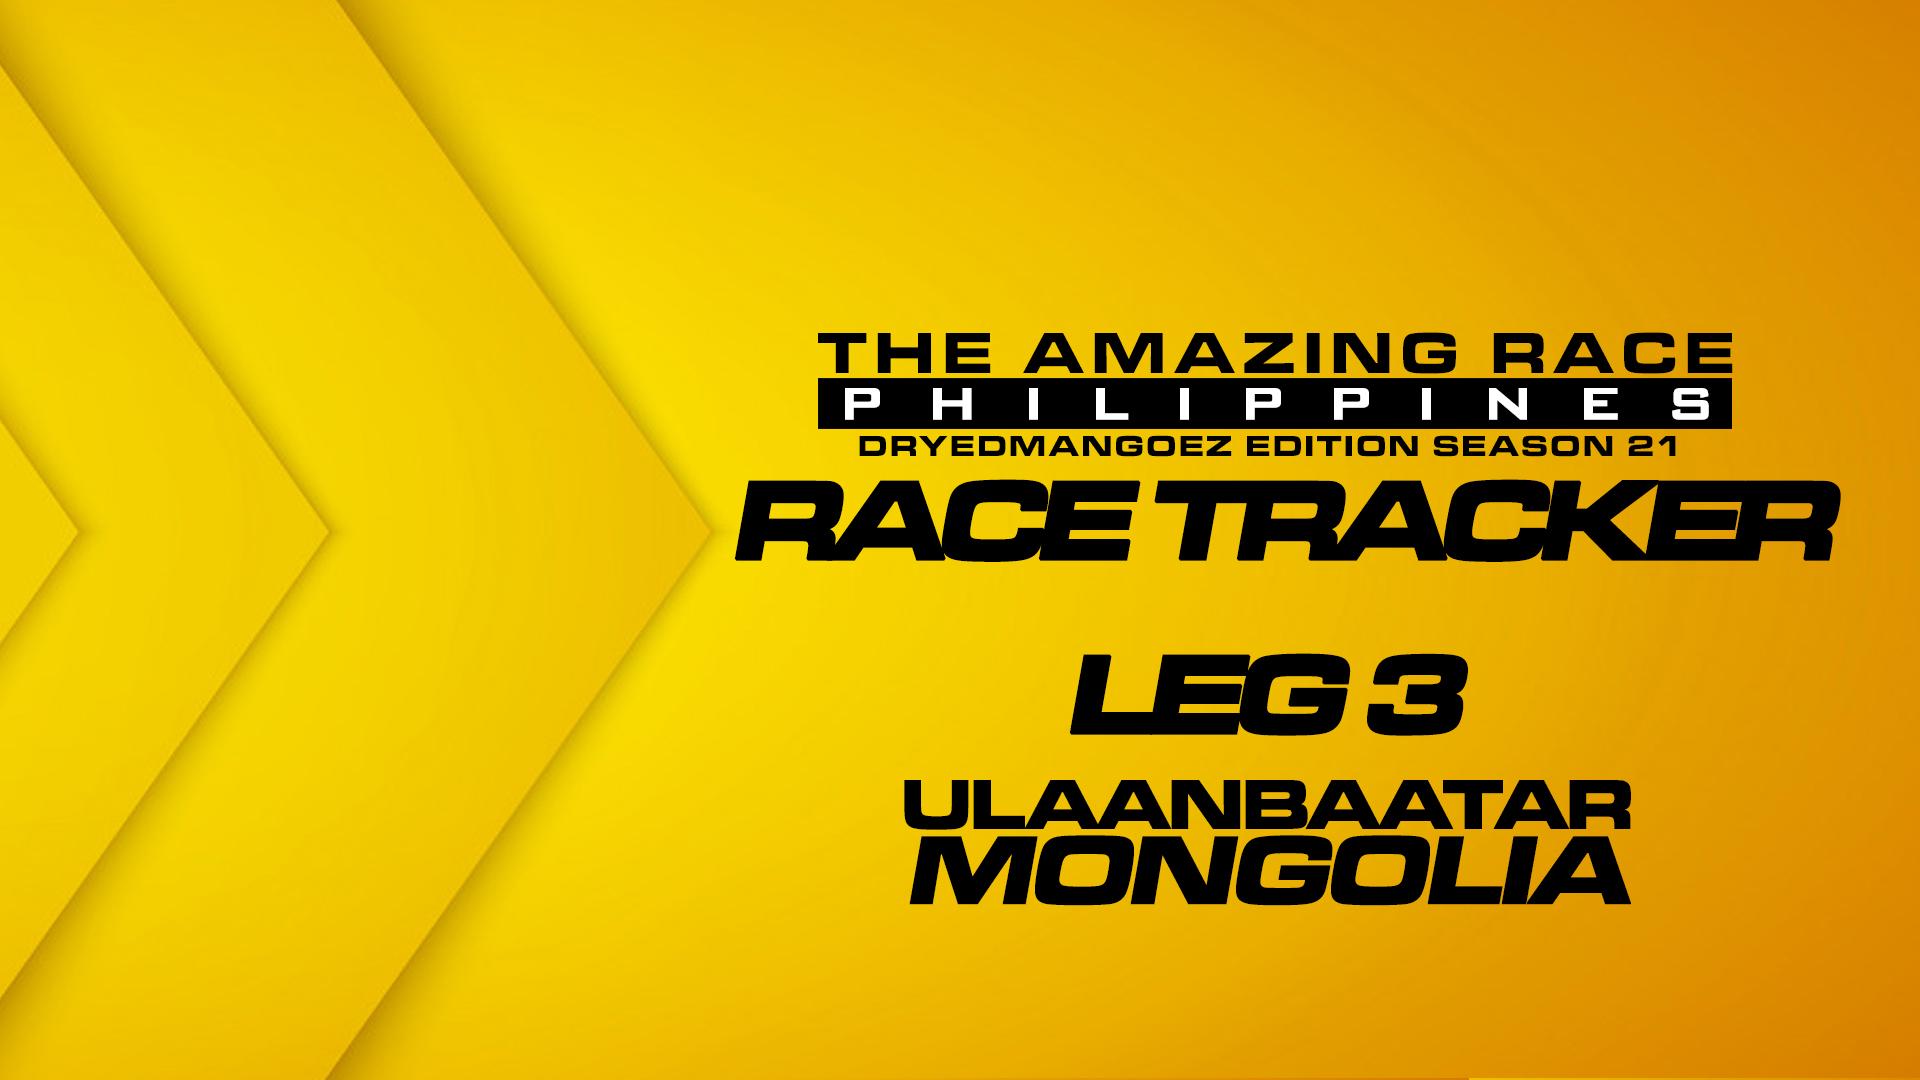 The Amazing Race Philippines: DryedMangoez Edition Season 21 Race Tracker – Leg 3